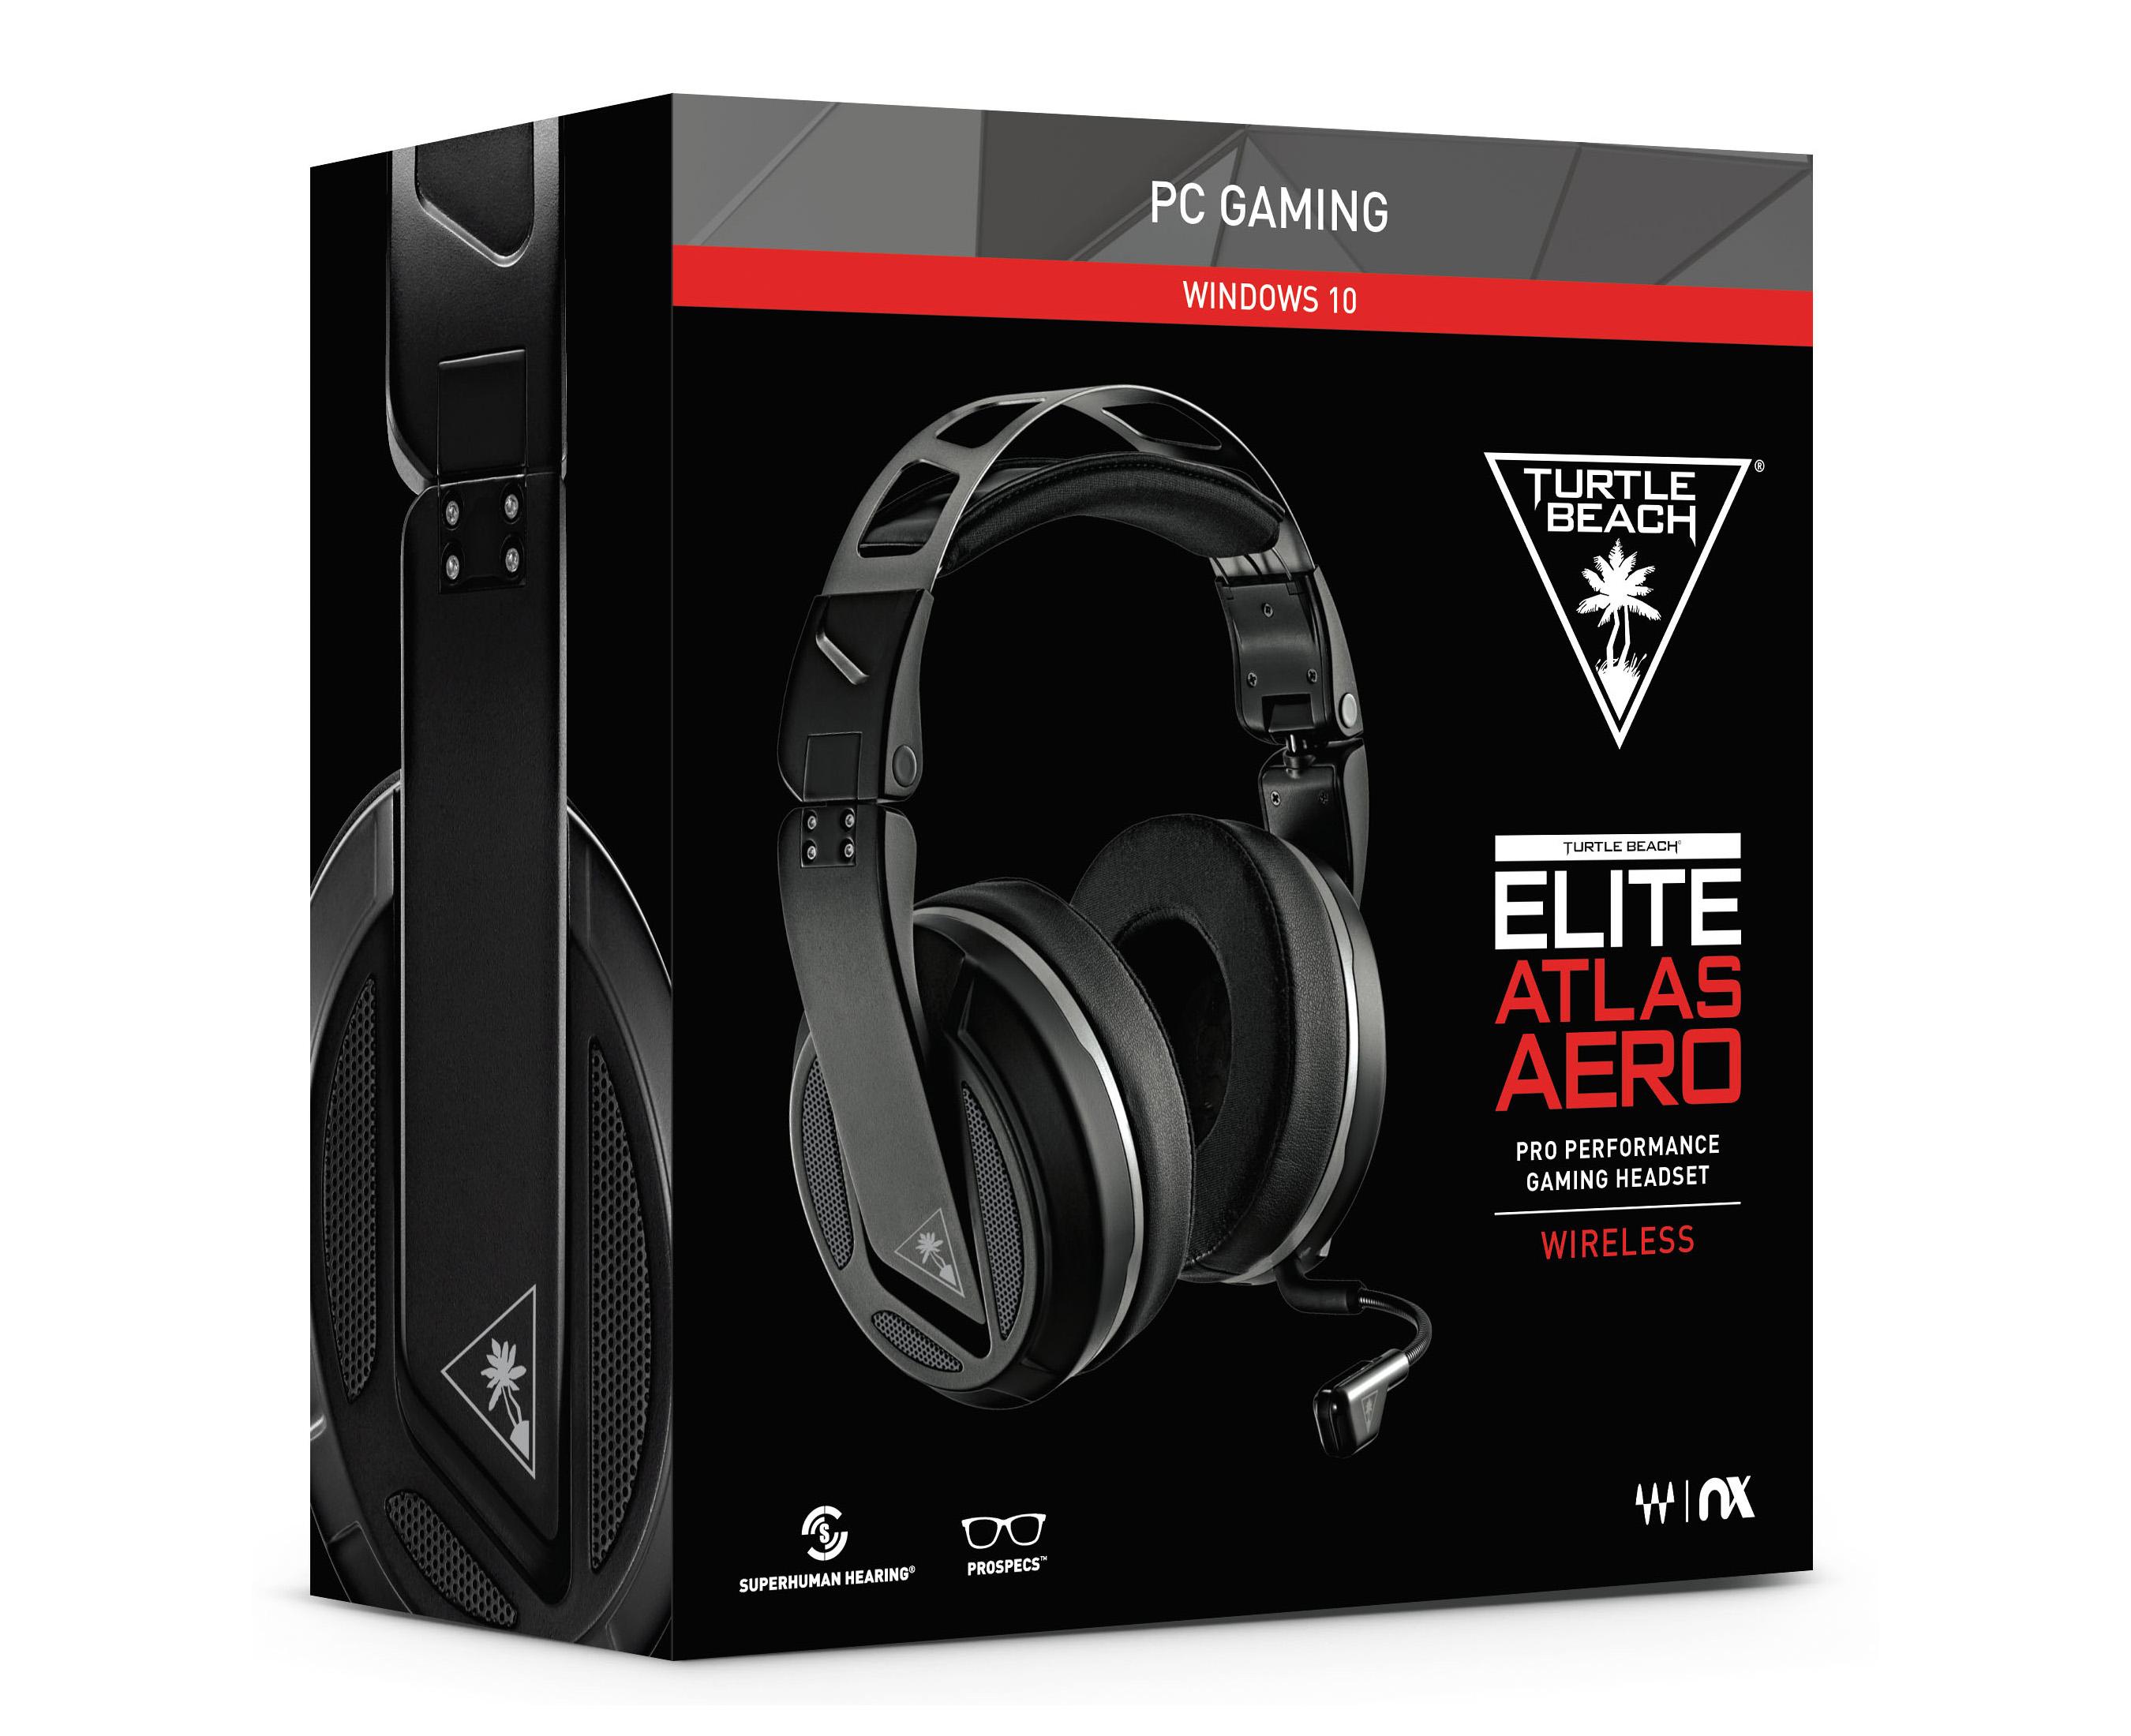 Elite Atlas Aero Wireless High-Performance PC Headset